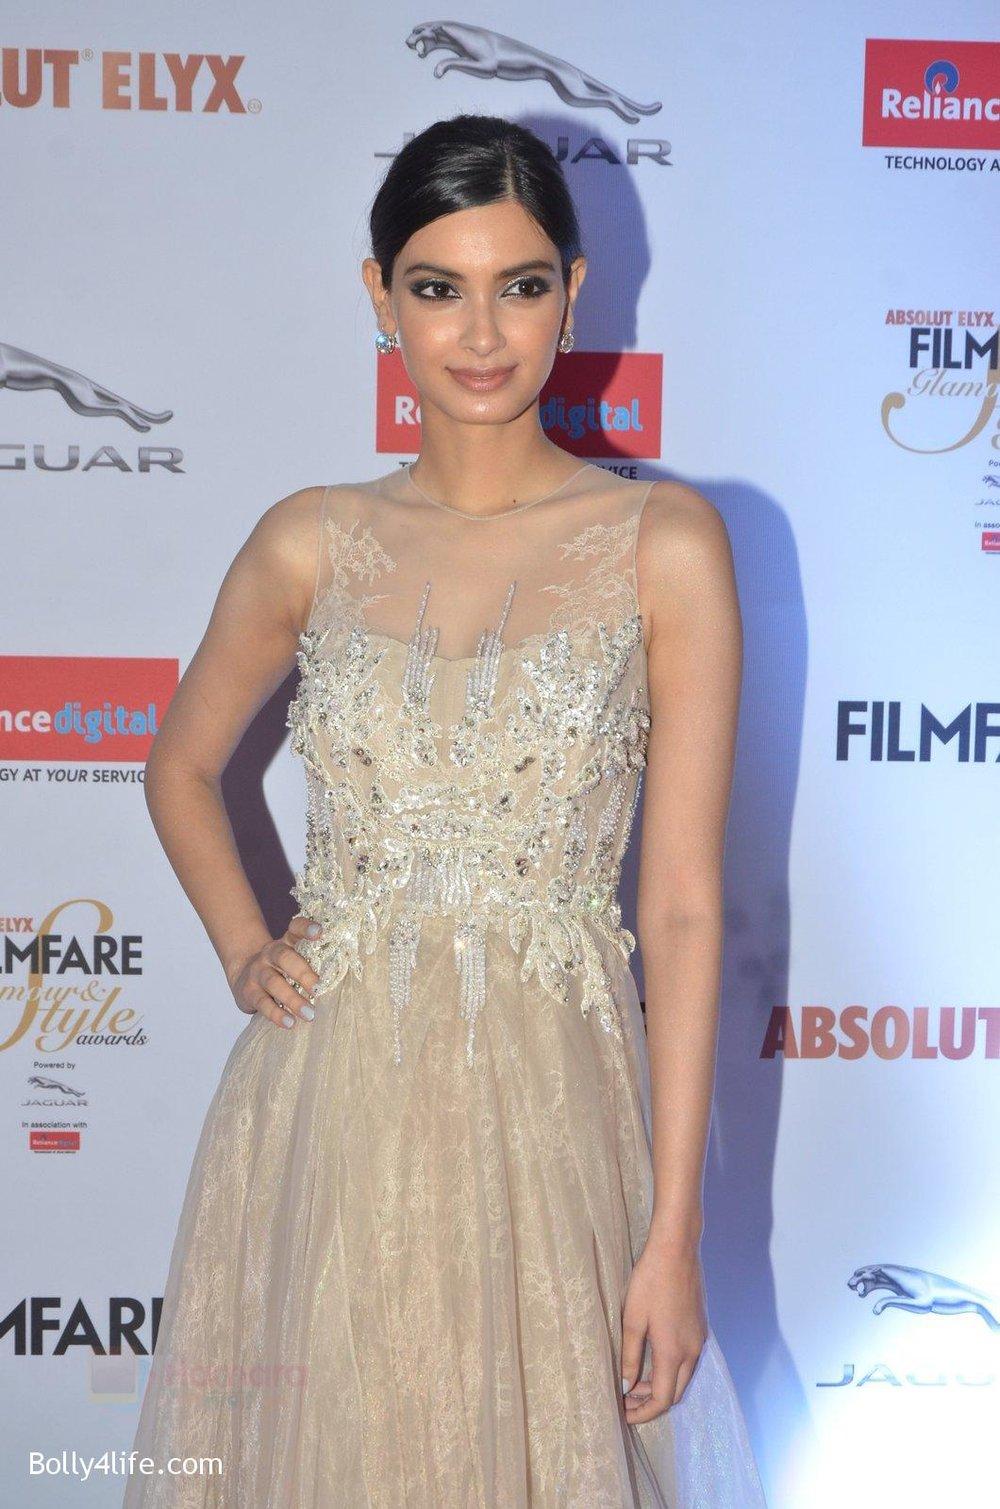 Diana-Penty-at-Filmfare-Glamour-Style-Awards-2016-in-Mumbai-on-15th-Oct-2016-1806.jpg